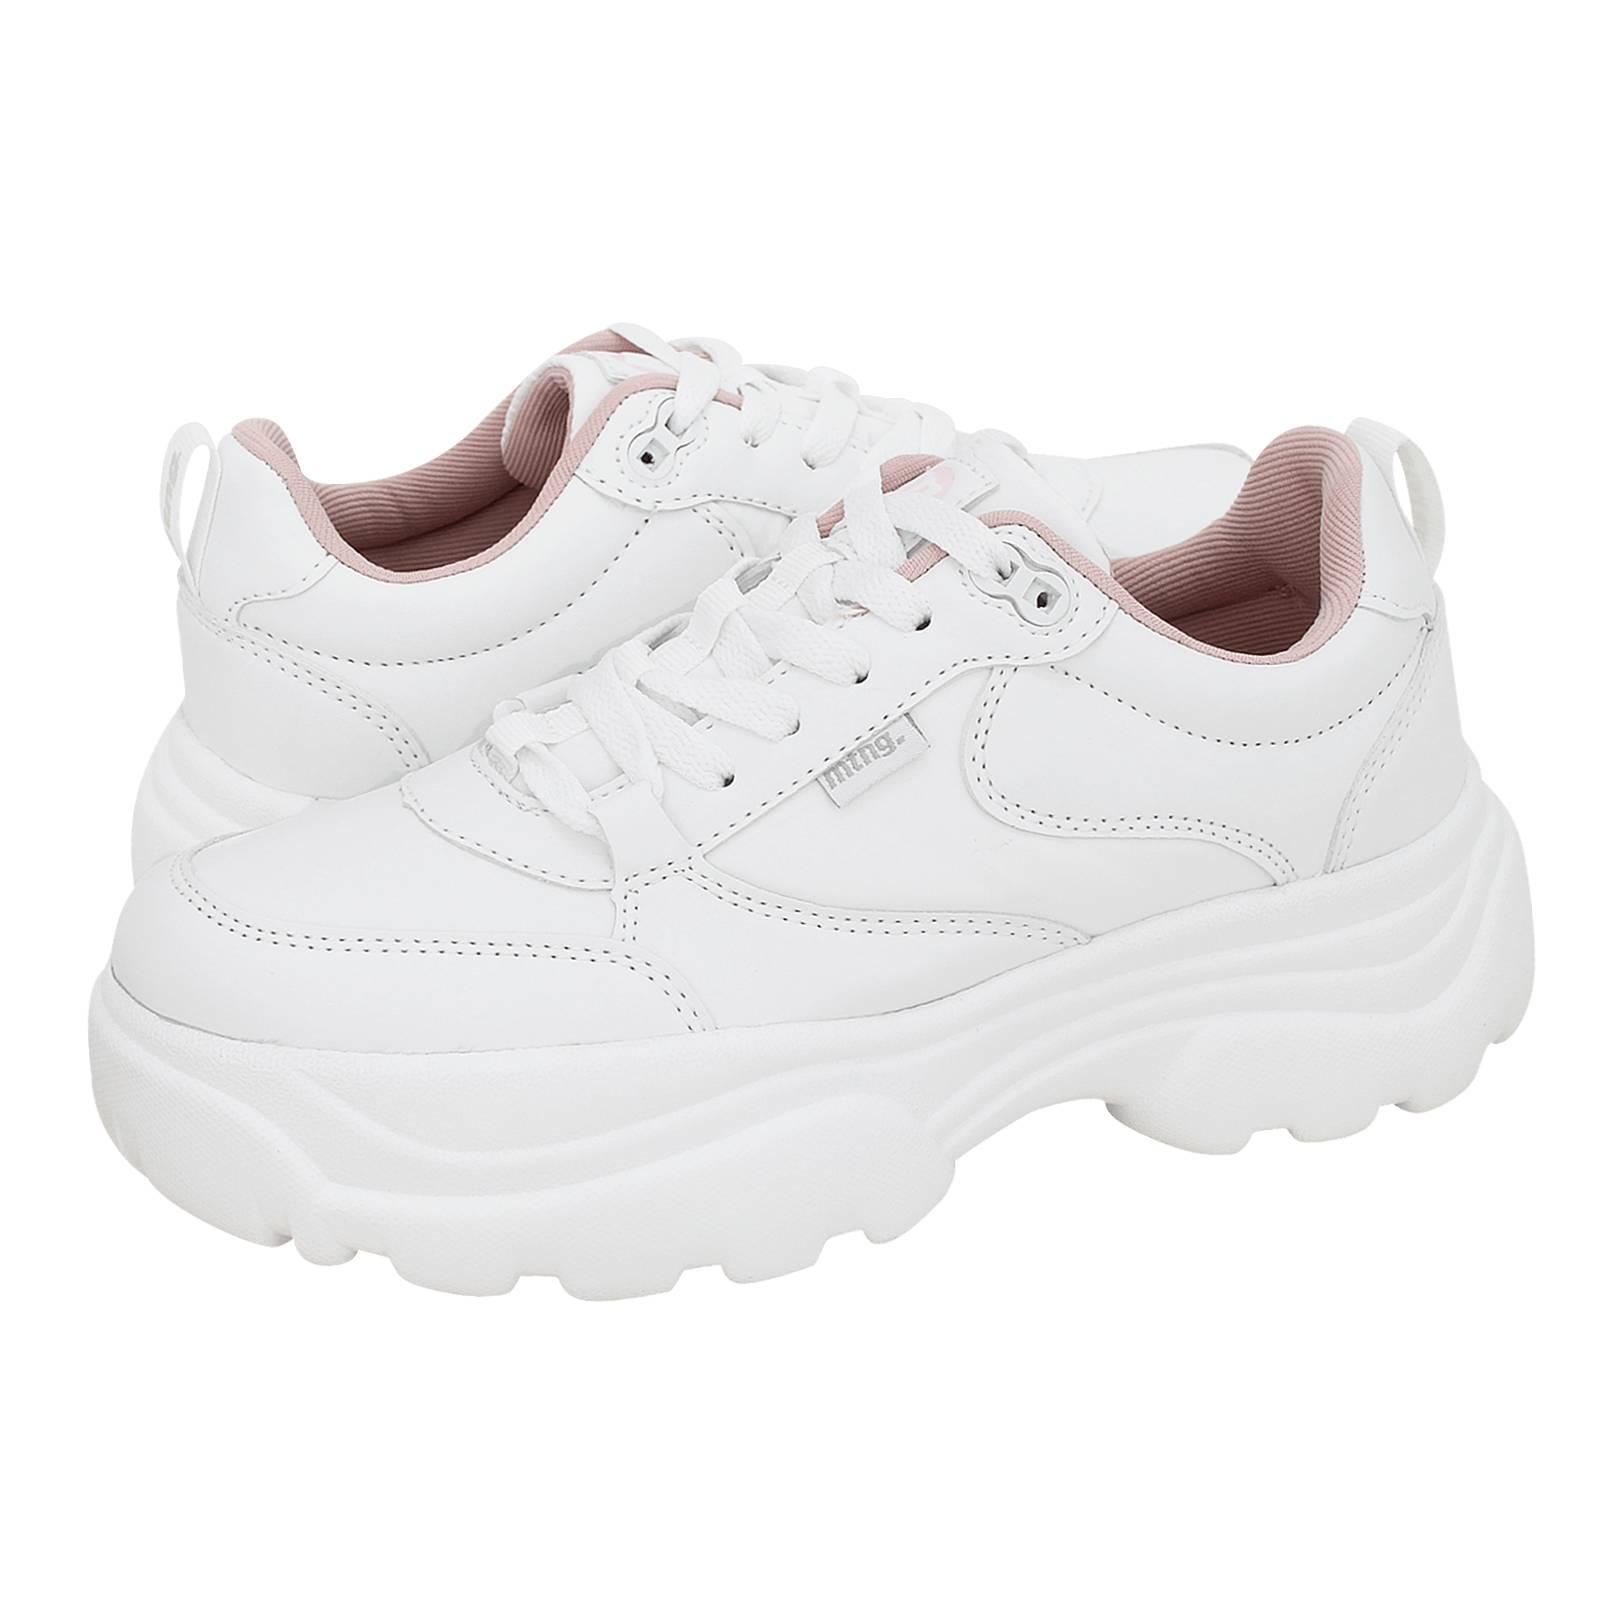 Creissels - Γυναικεία παπούτσια casual MTNG Attitude από δερμα ... 5d156d4457f